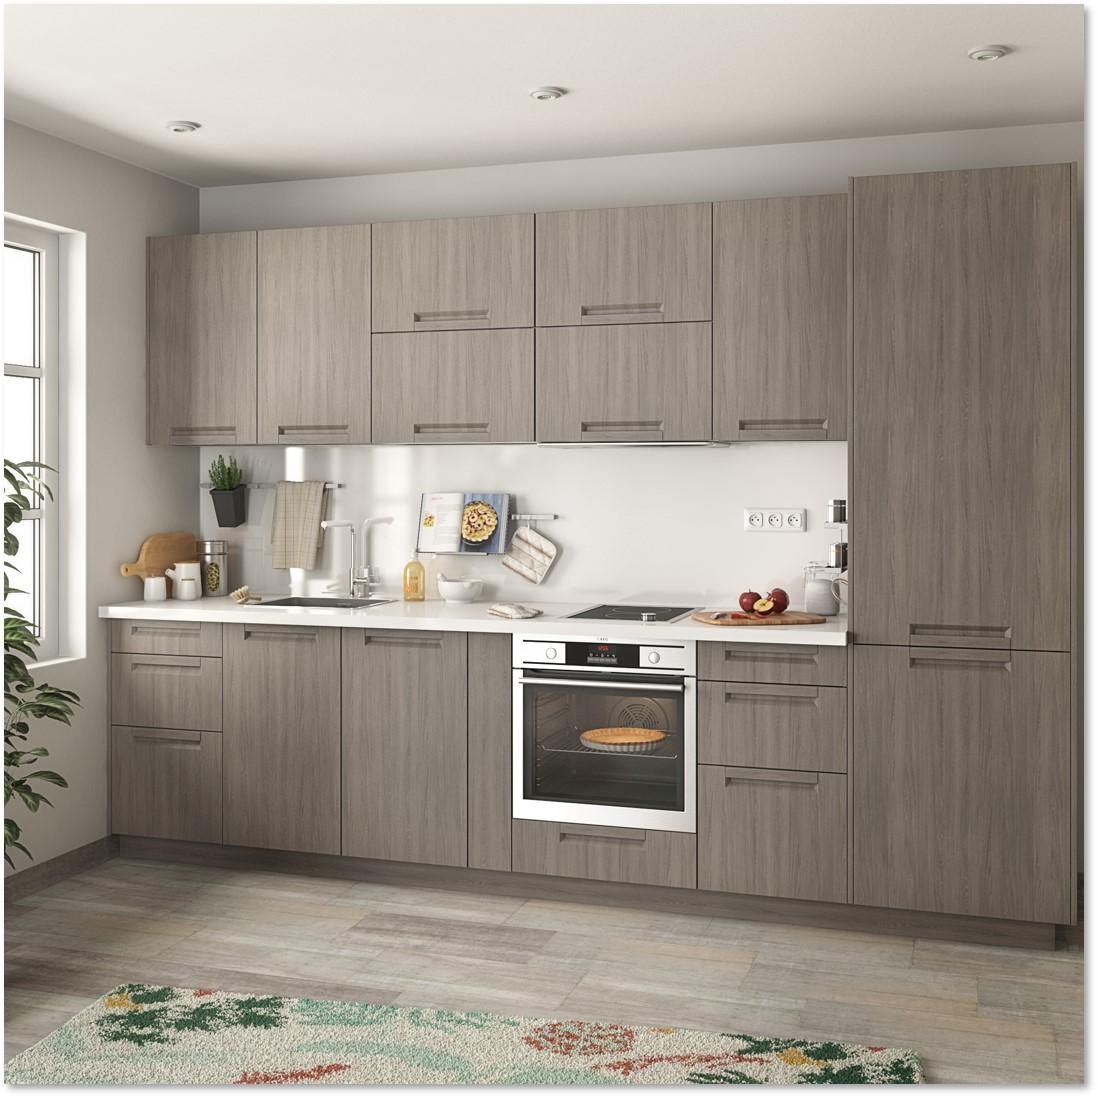 Delinia Detroit Designer Kitchen - Example 2